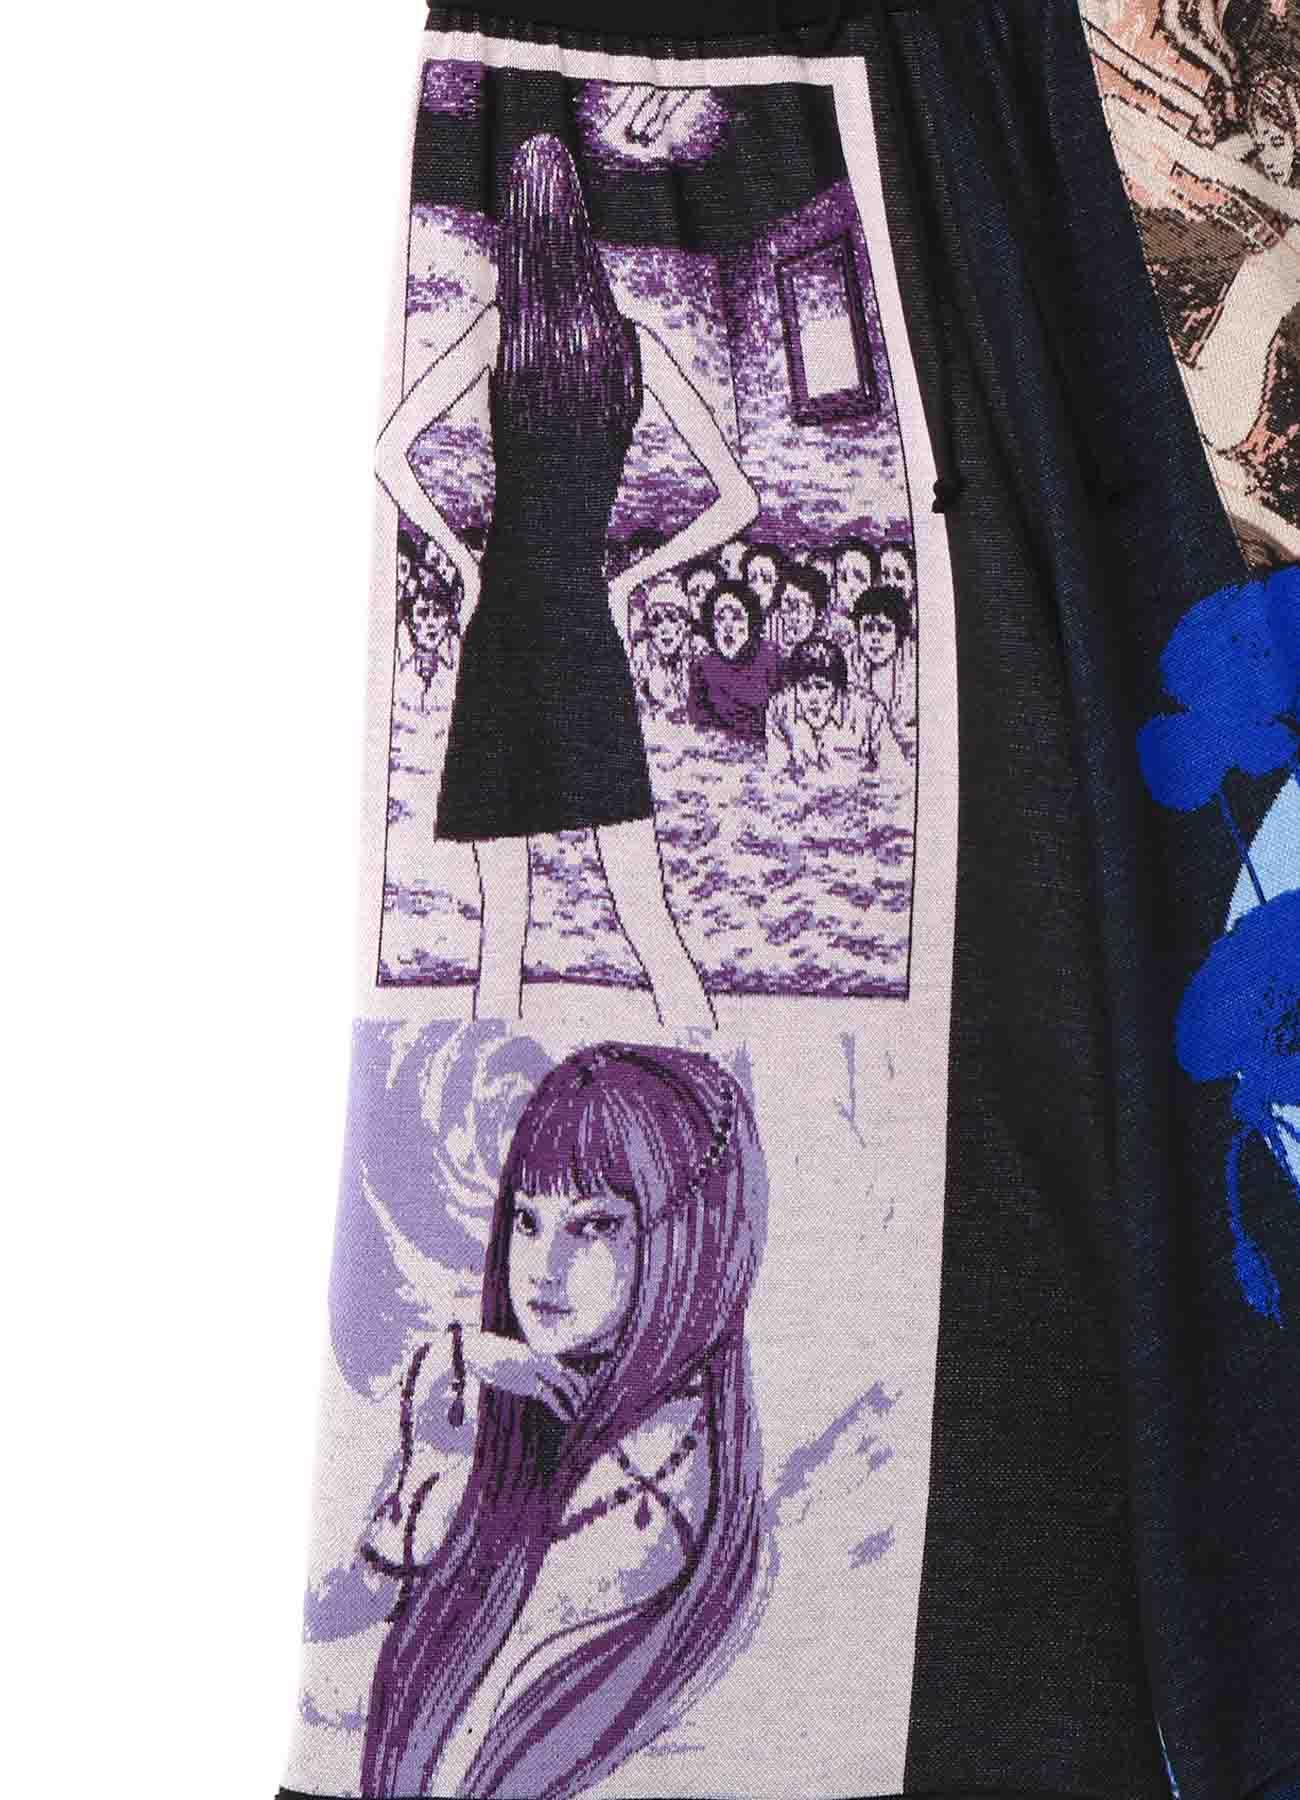 Junji ITO Twisted Visions/Tomie Hameauze Jacquard Culottes Pants